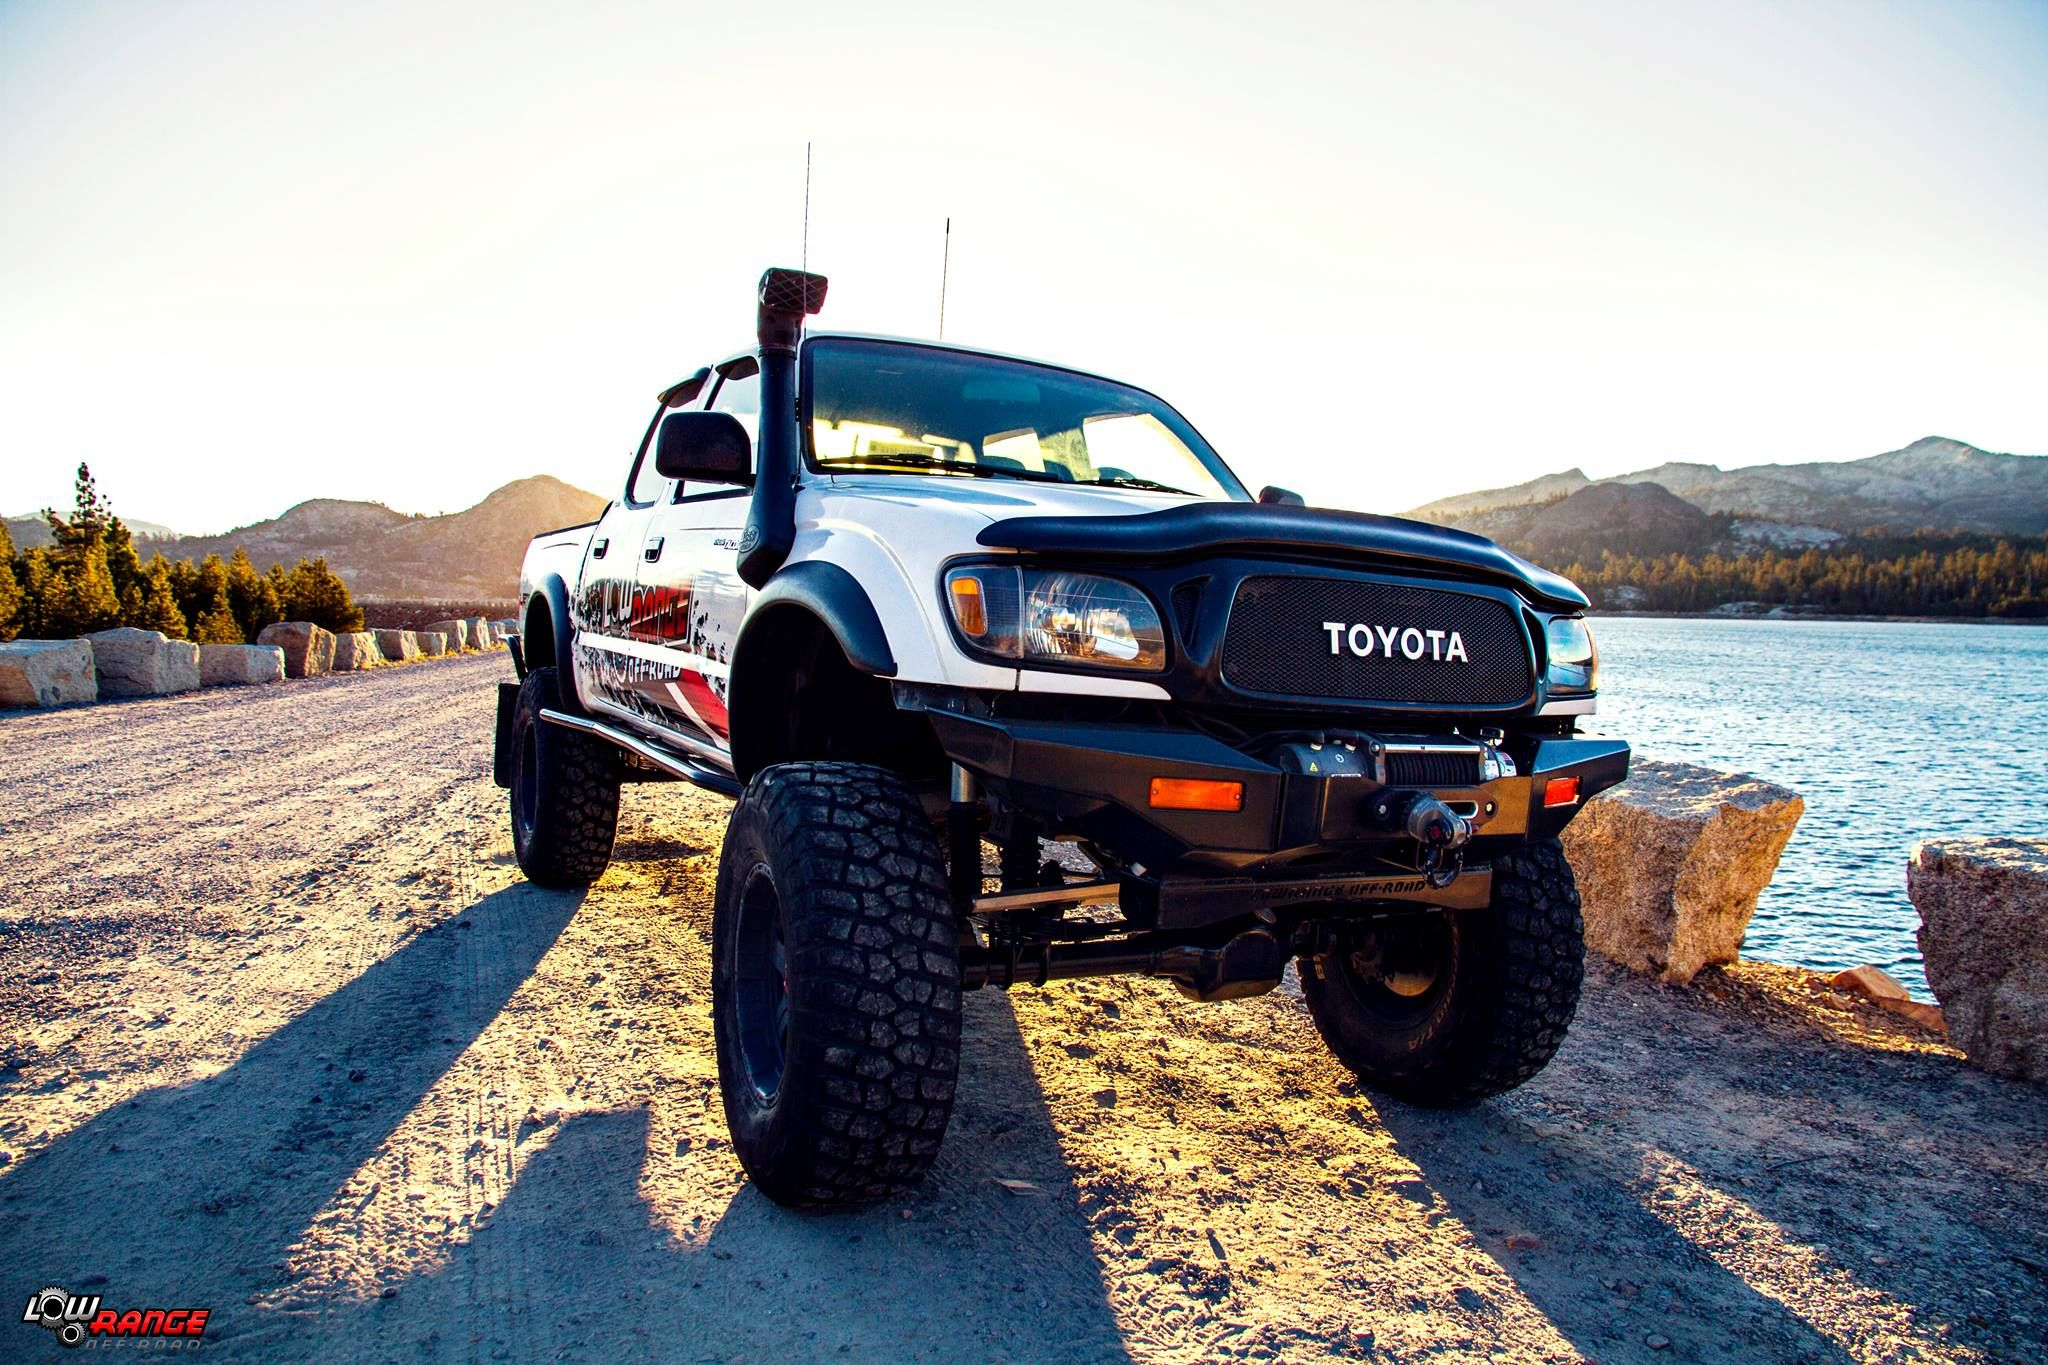 Toyota Tacoma Rockcrawler Rubicontrail Lake Dam Snorkel Toyotatacoma Mcr Marlincrawlerroundup L Toyota Tacoma 2004 Toyota Tacoma Tacoma Accessories